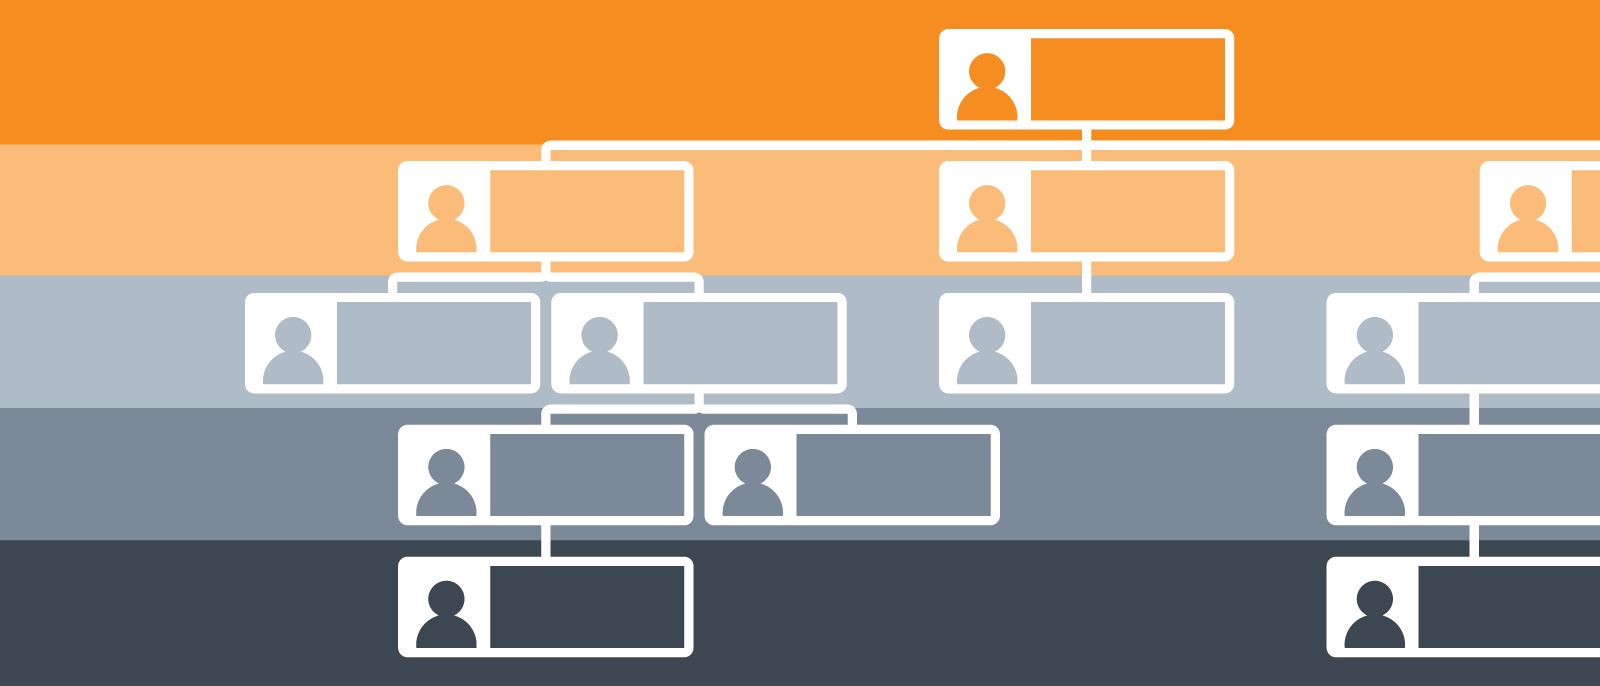 organisation chart templates